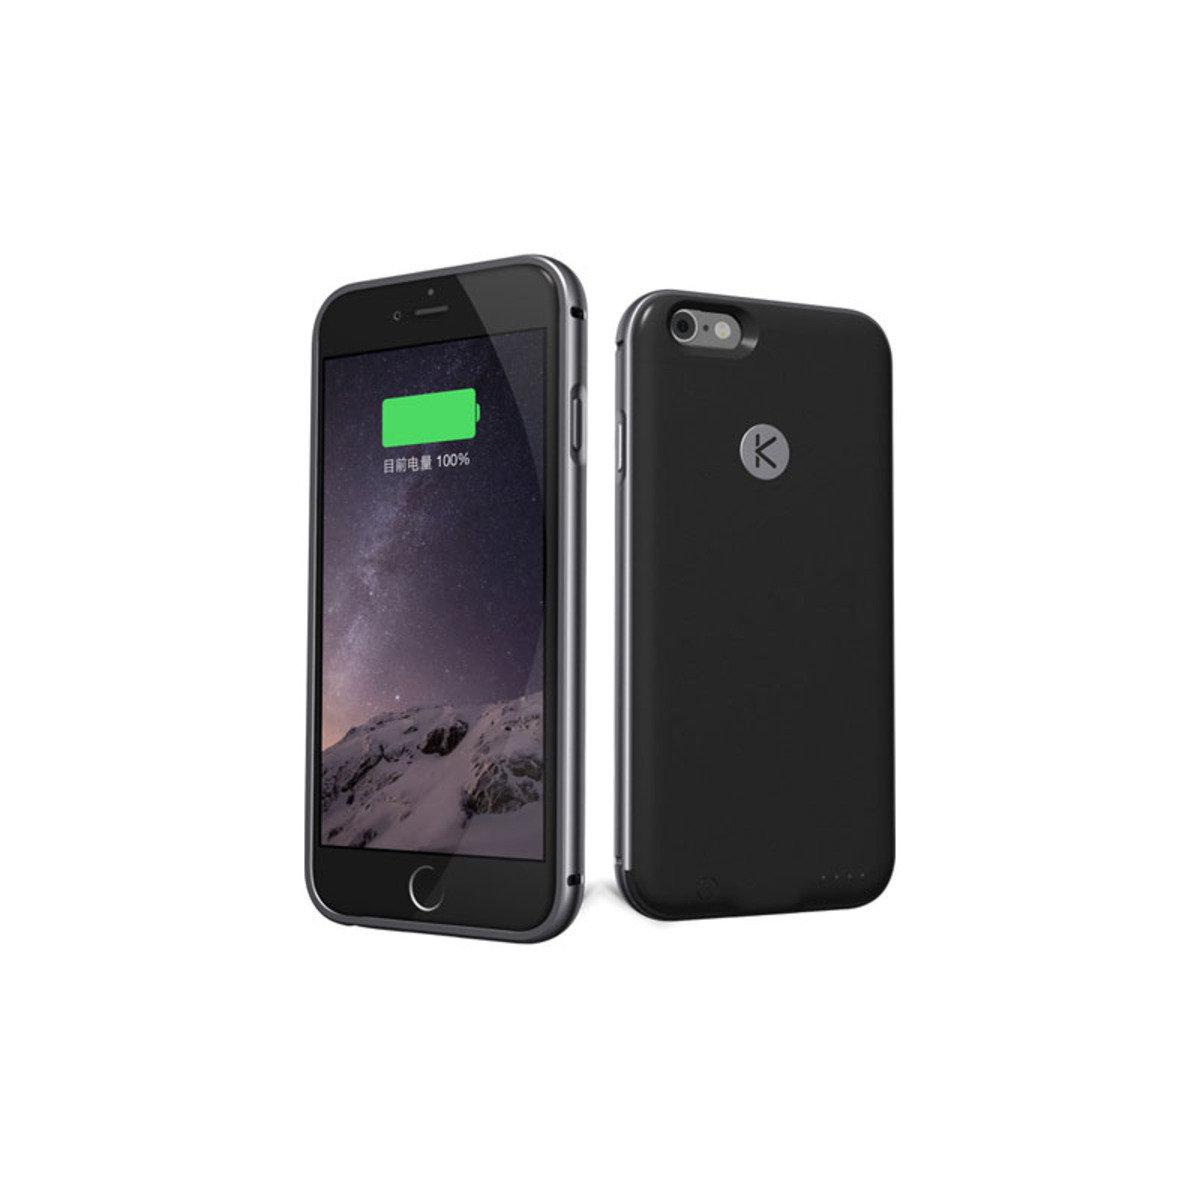 iPhone 6 / 6S 專用金屬邊框機殼連2400mAh充電池 太空灰+黑色